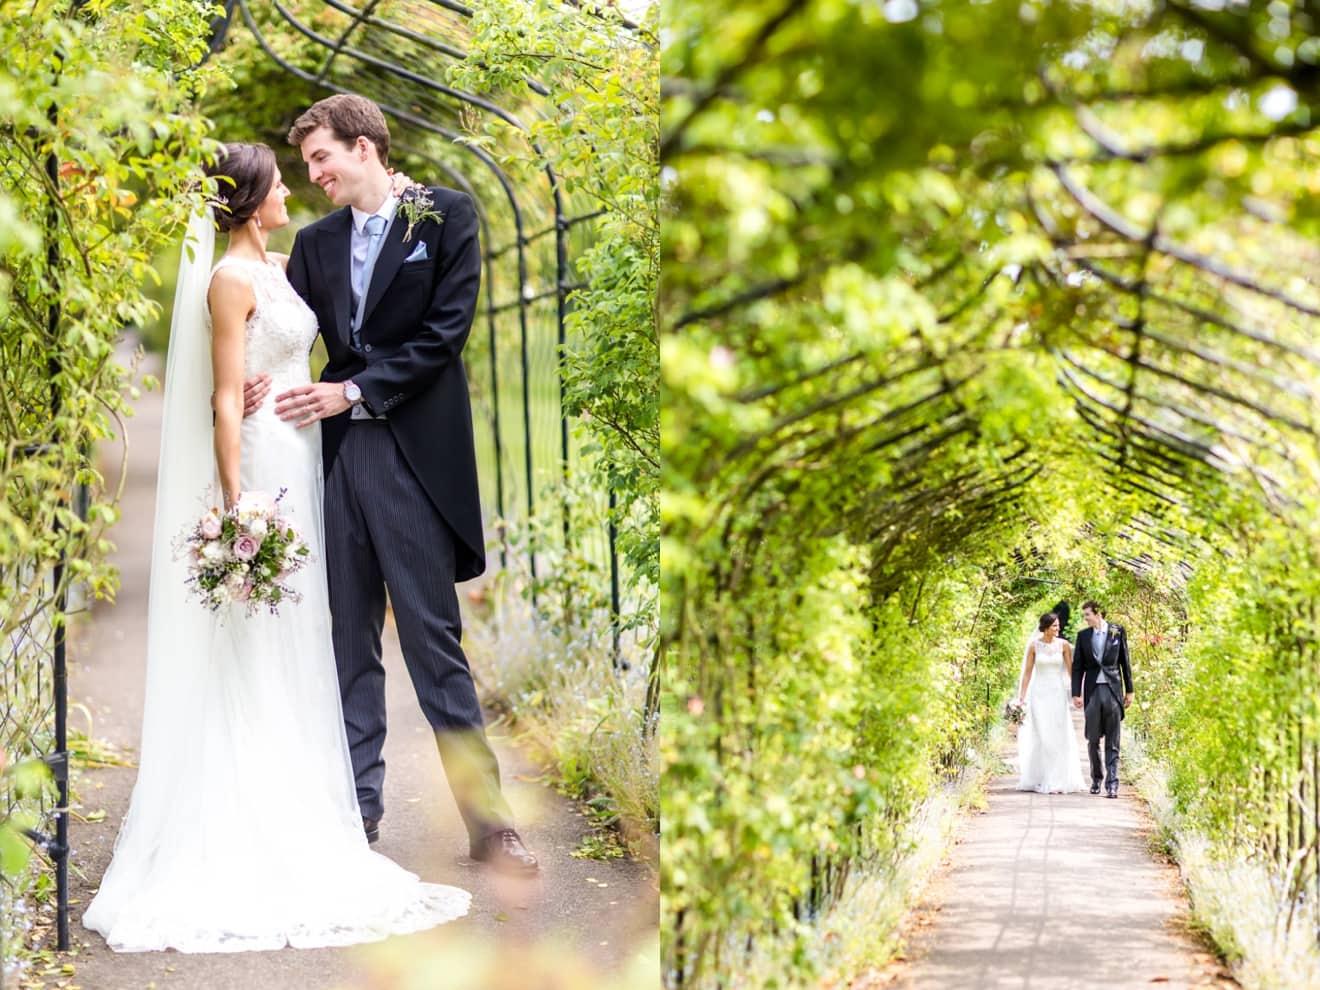 13-nonsuch-mansion-ali-tom-wedding-Eddie-Judd-Photography